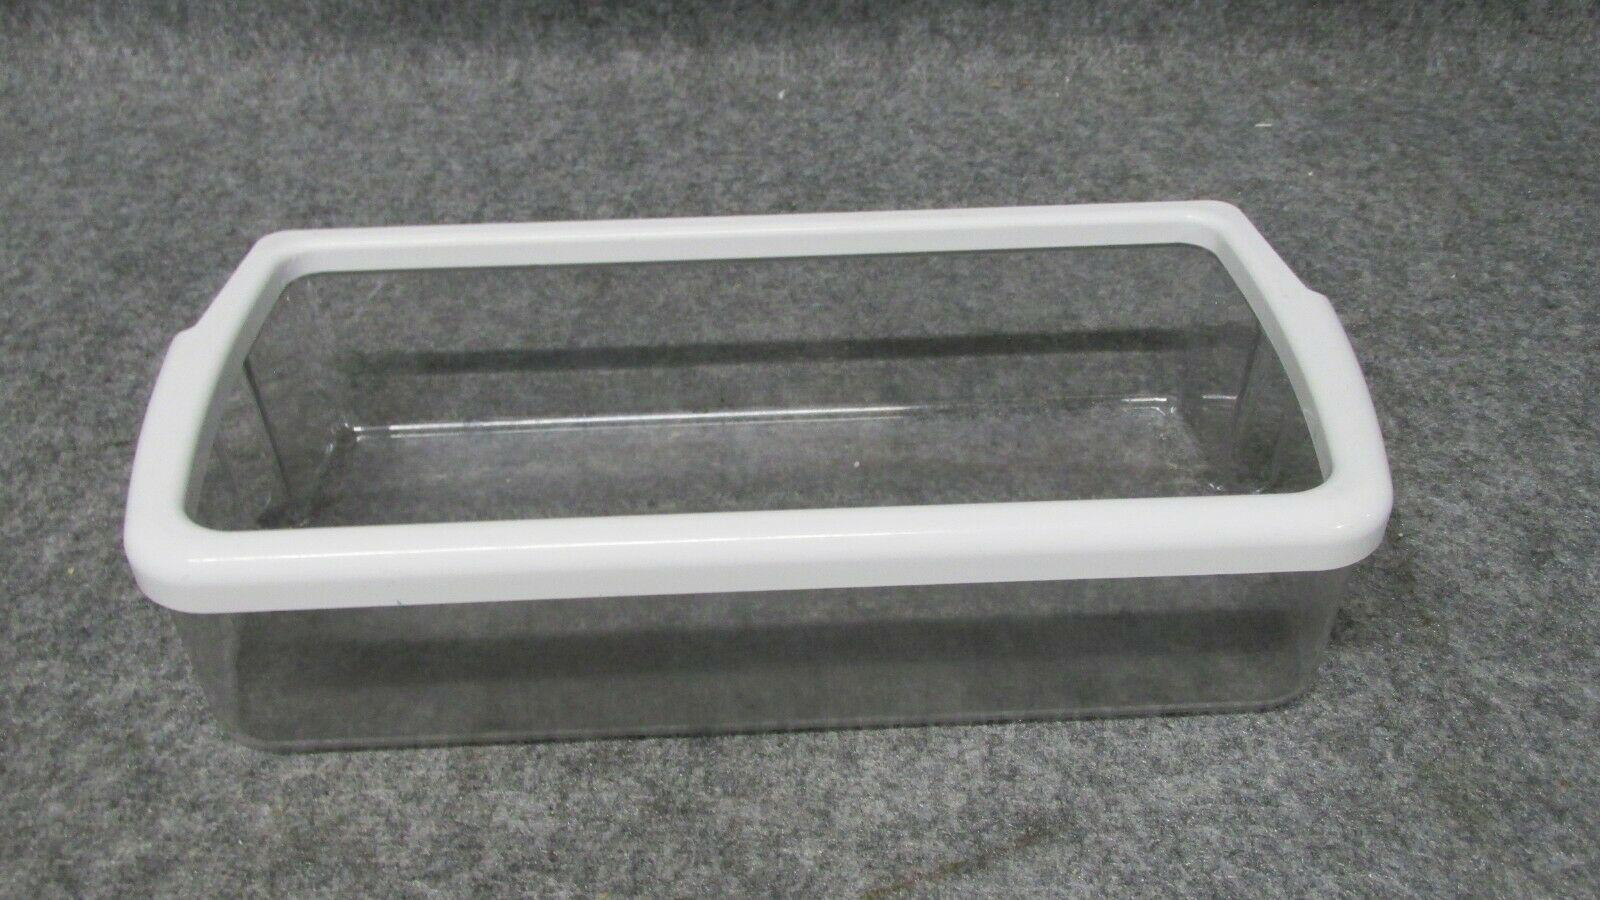 WP2223463K  Whirlpool Refrigerator Door Shelf Bin